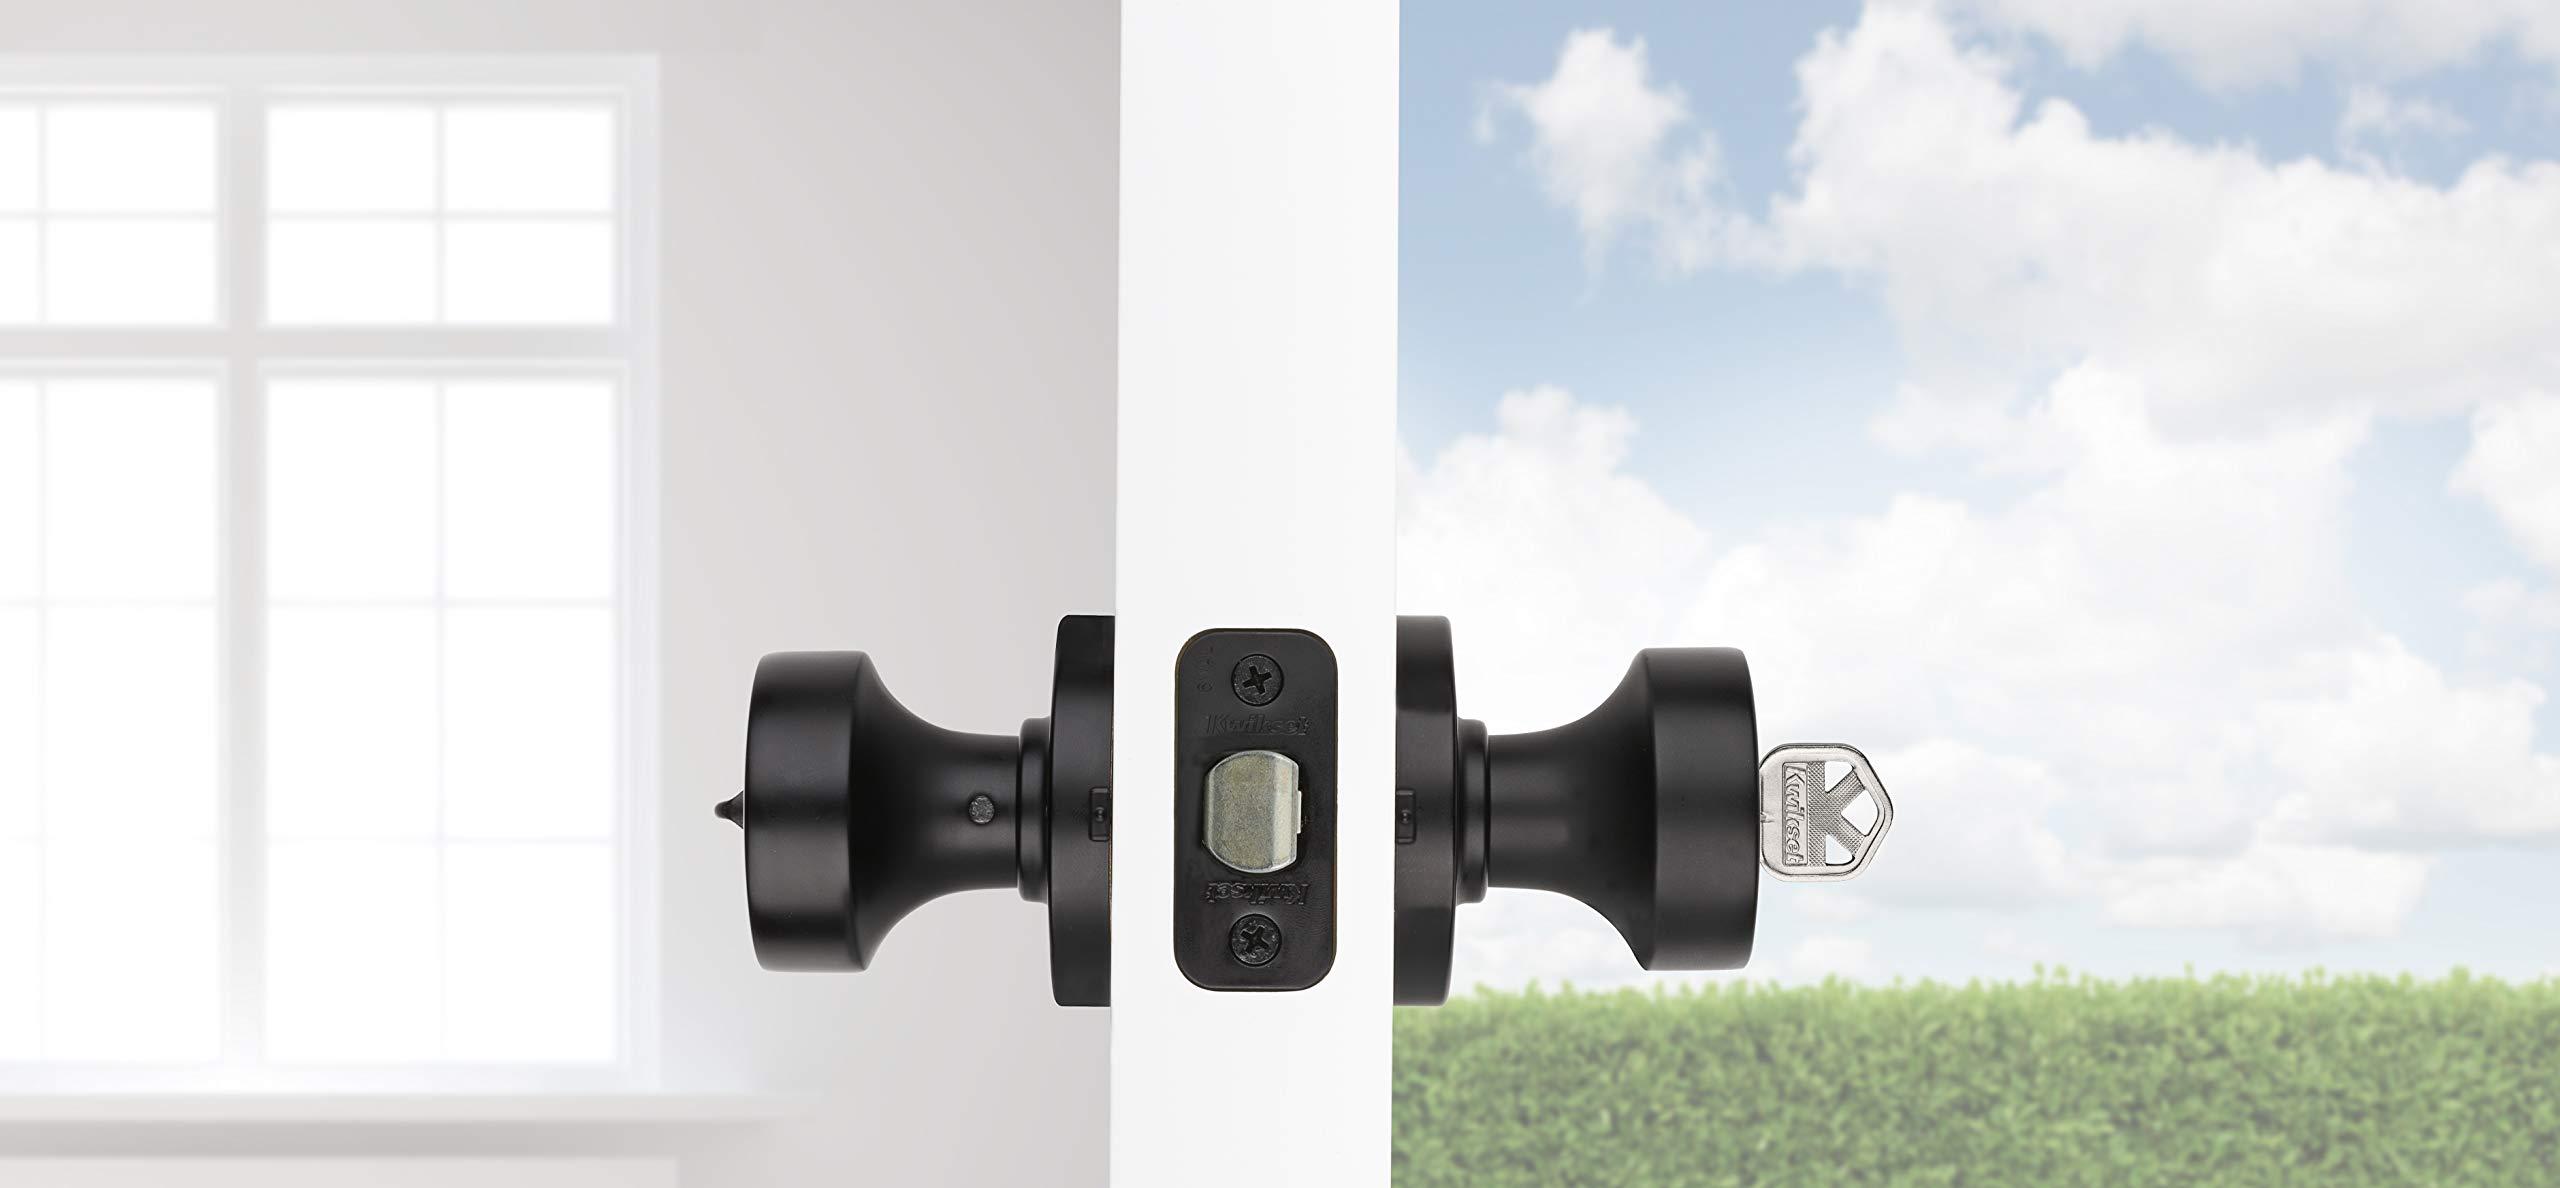 Kwikset 97402-854 Pismo Keyed Entry Door Knob Featuring SmartKey Security Iron Black by Kwikset (Image #4)